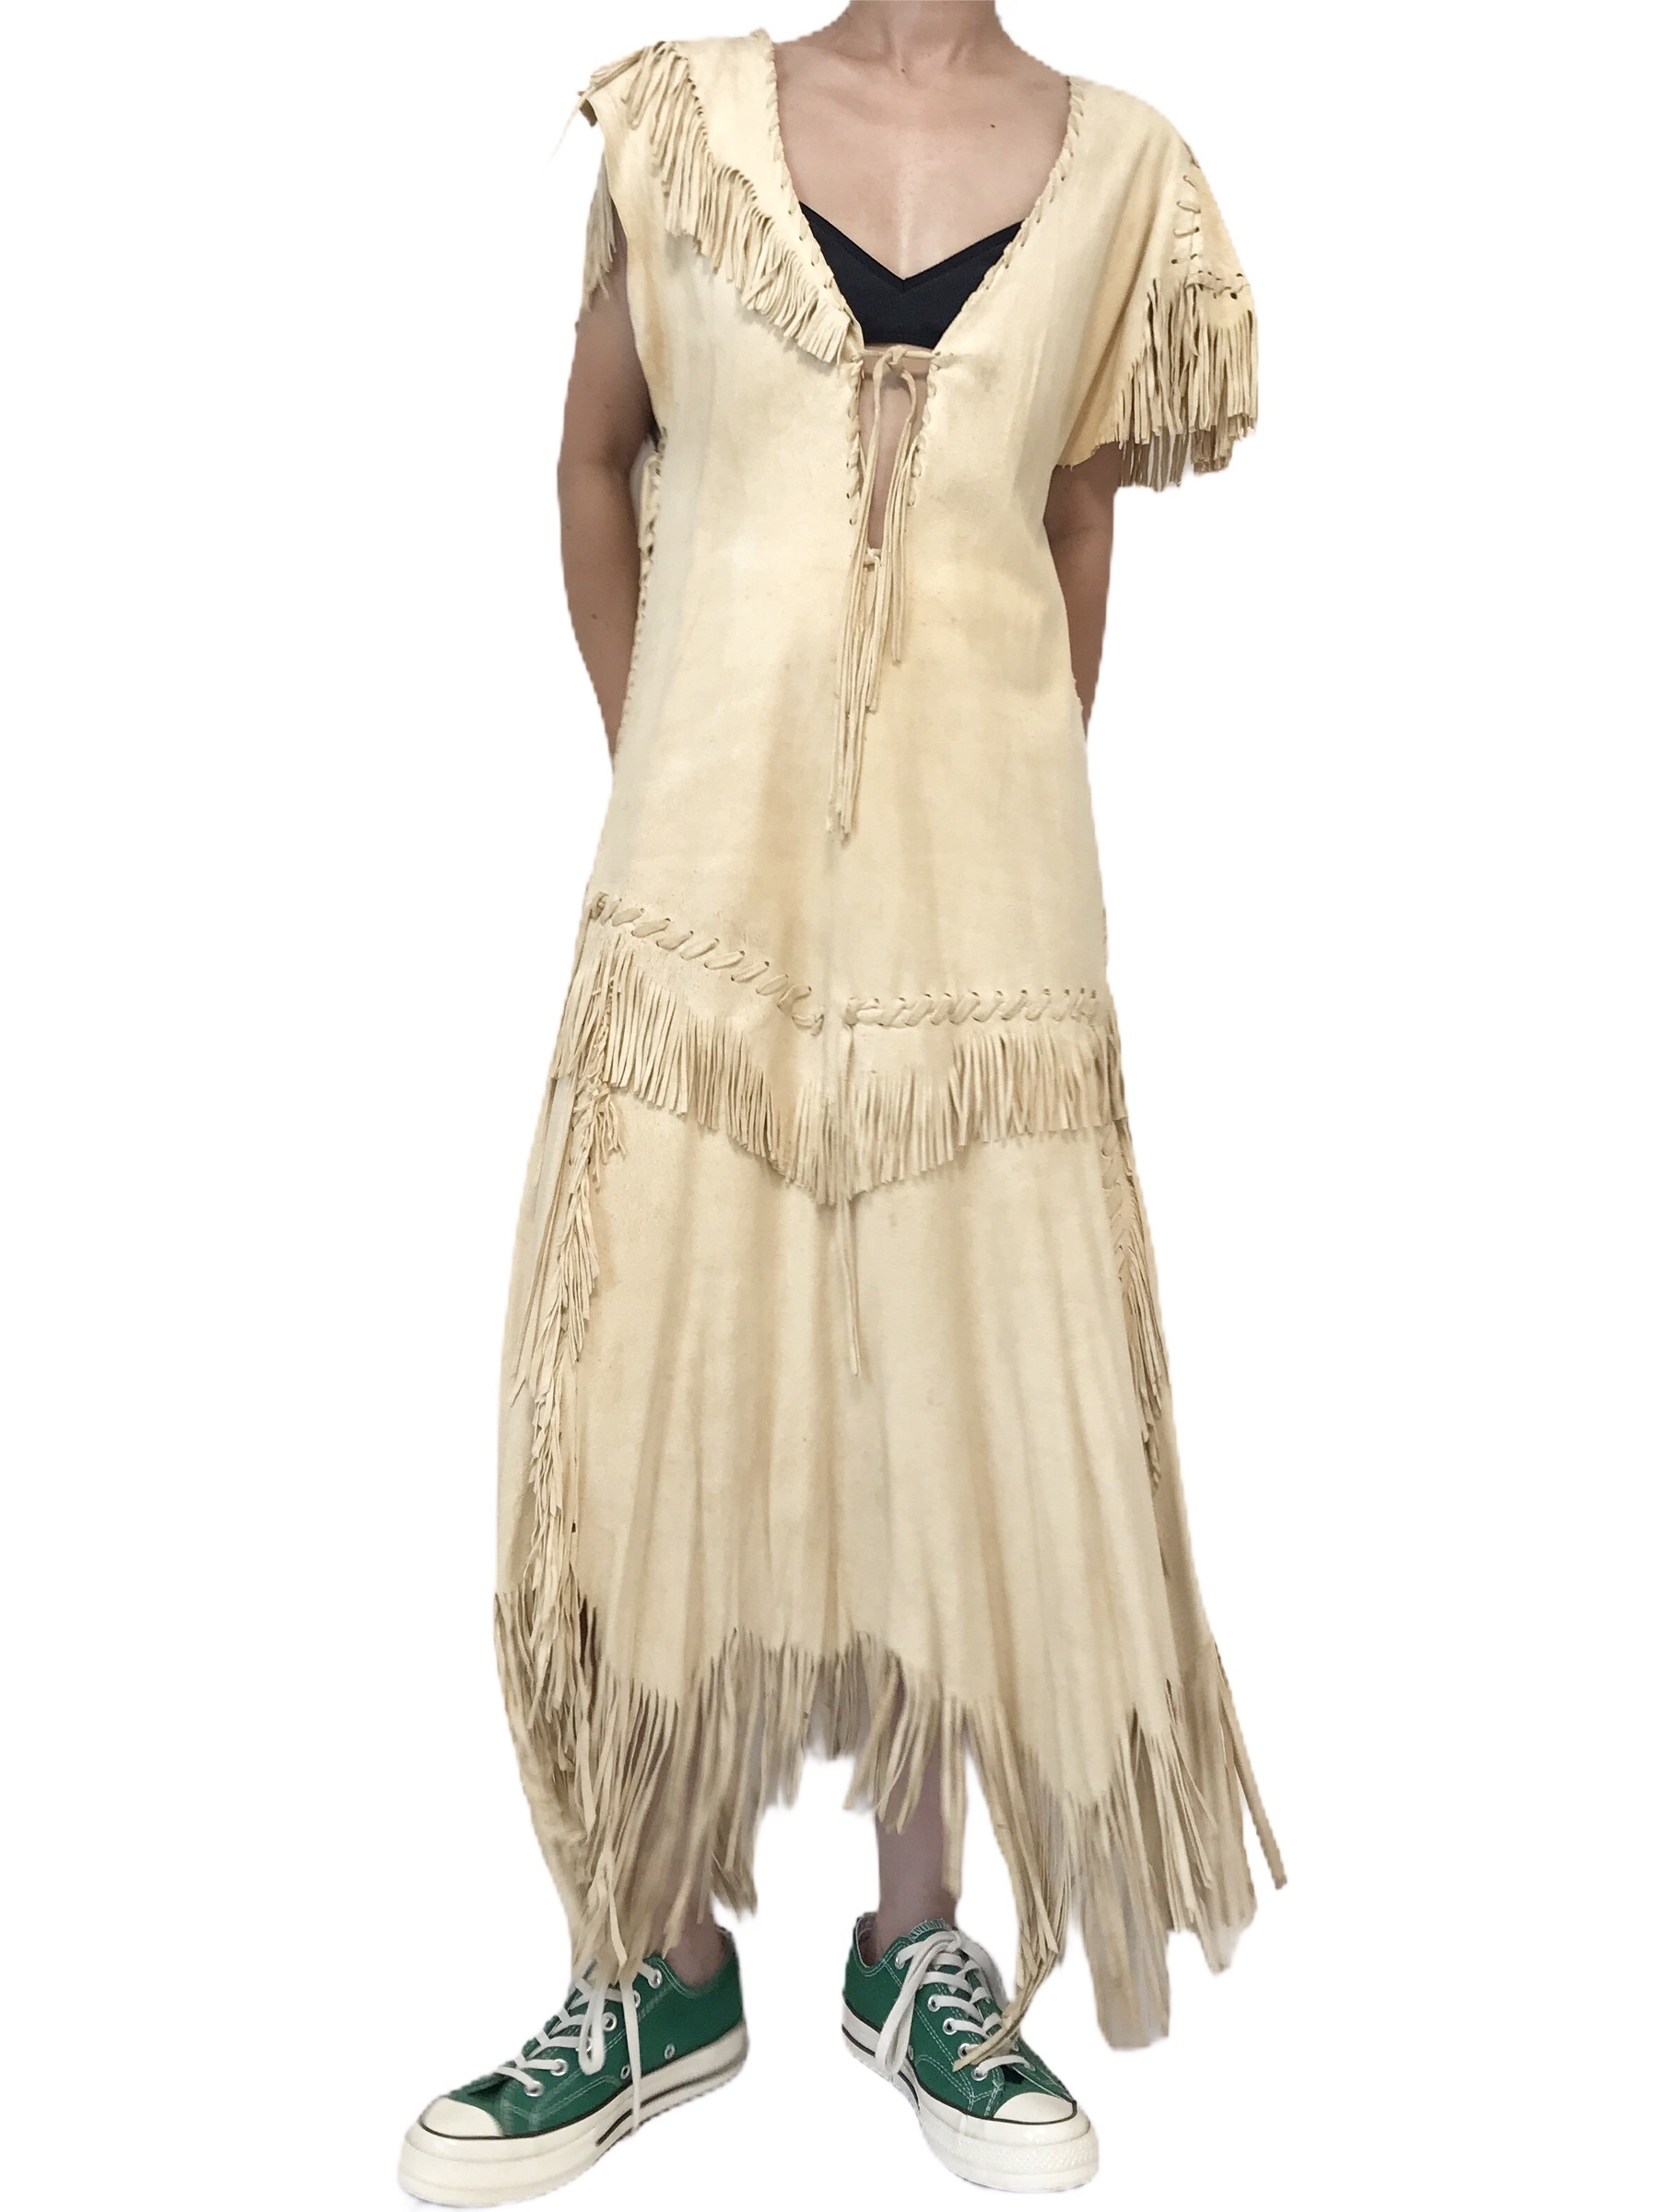 70's Vintage Ivory Deerskin Handcrafted Dress